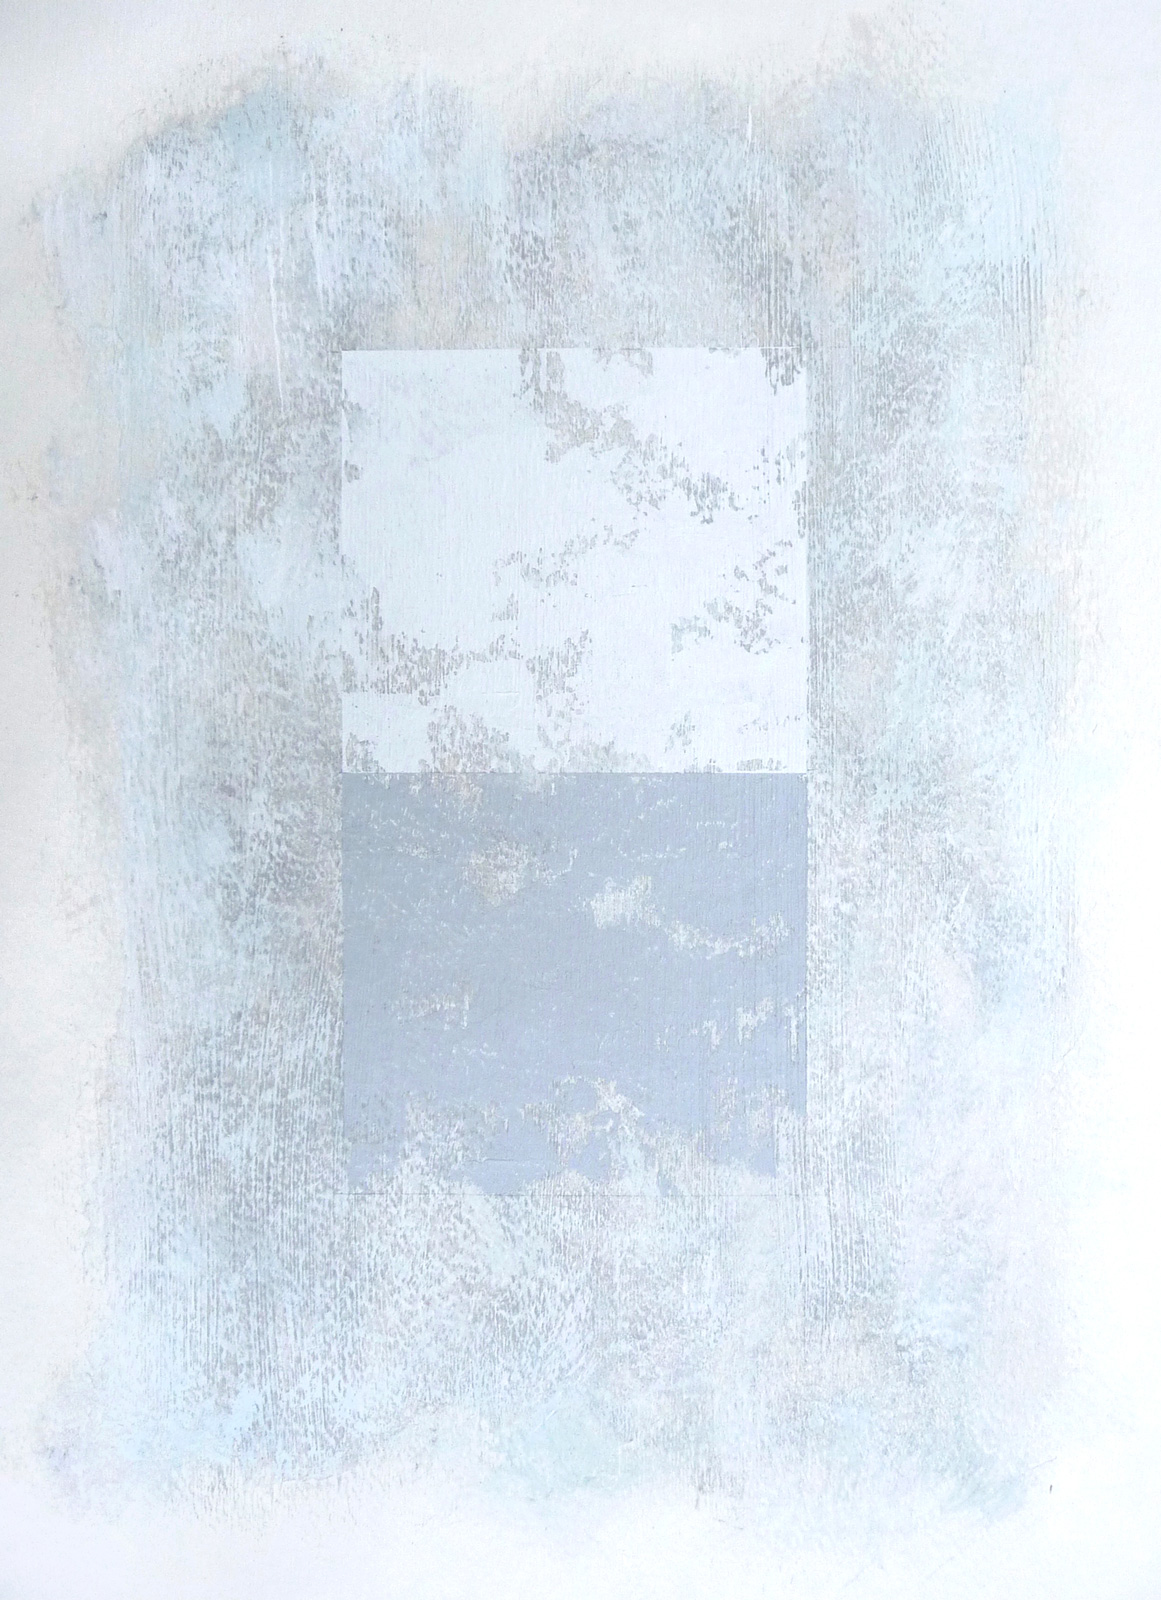 Svinoya in White I , 2016.  Mixed media on paper. 15 x 11 inches (38.1 x 27.9 cm)